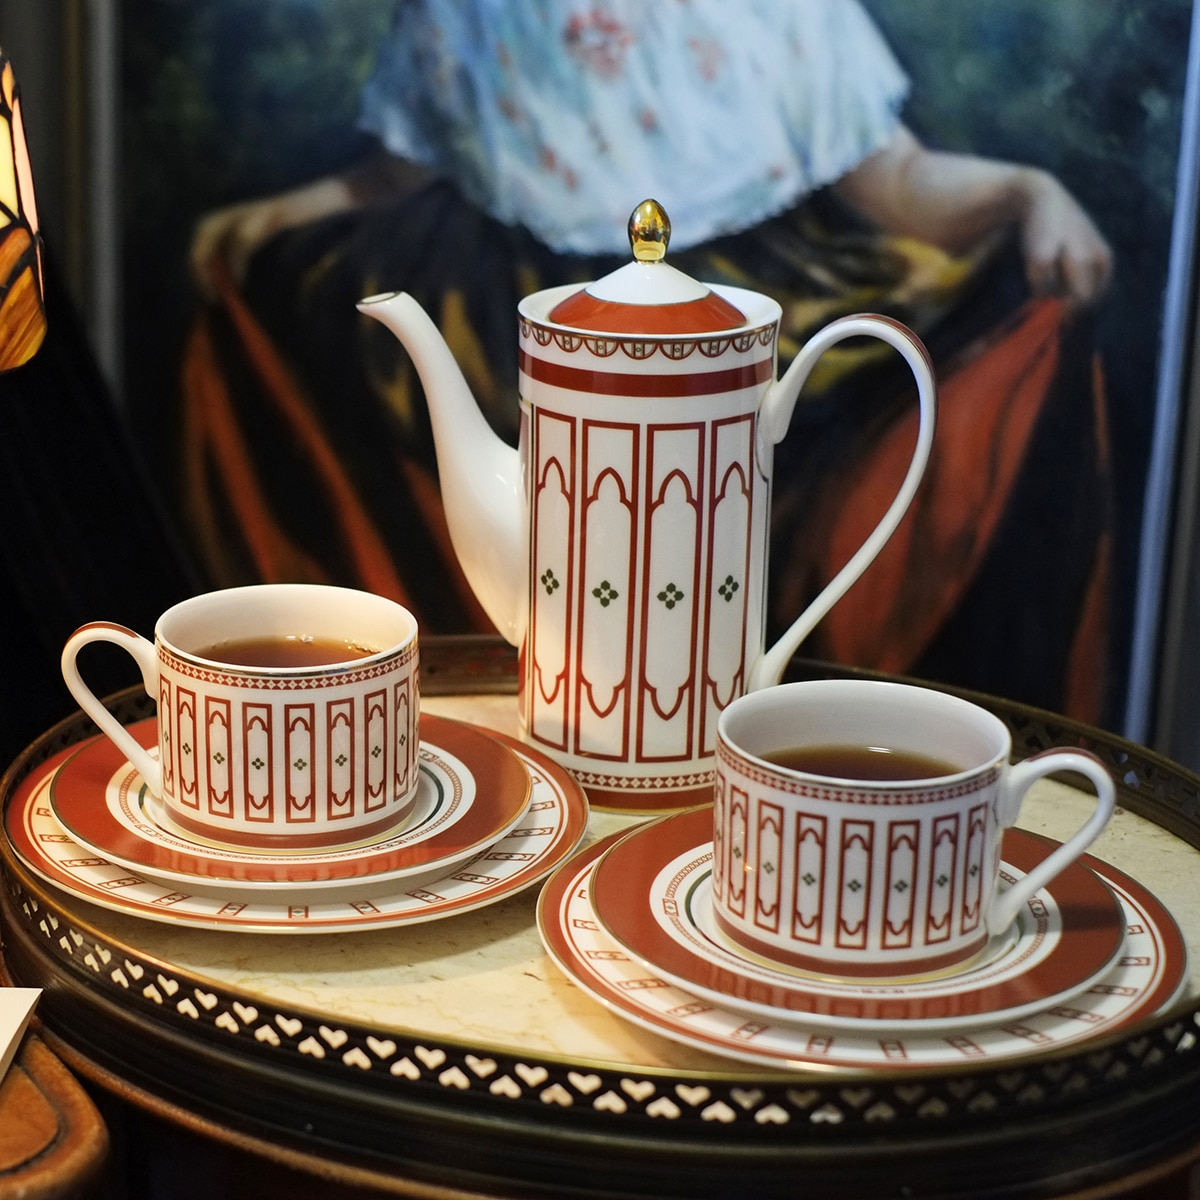 Nórdicos 15 obra Gouden Rand gris Roze Marmer Patroon Keramische Koffie te conjunto Ins Netwerk Creatieve China de hueso te conjunto olla Cu